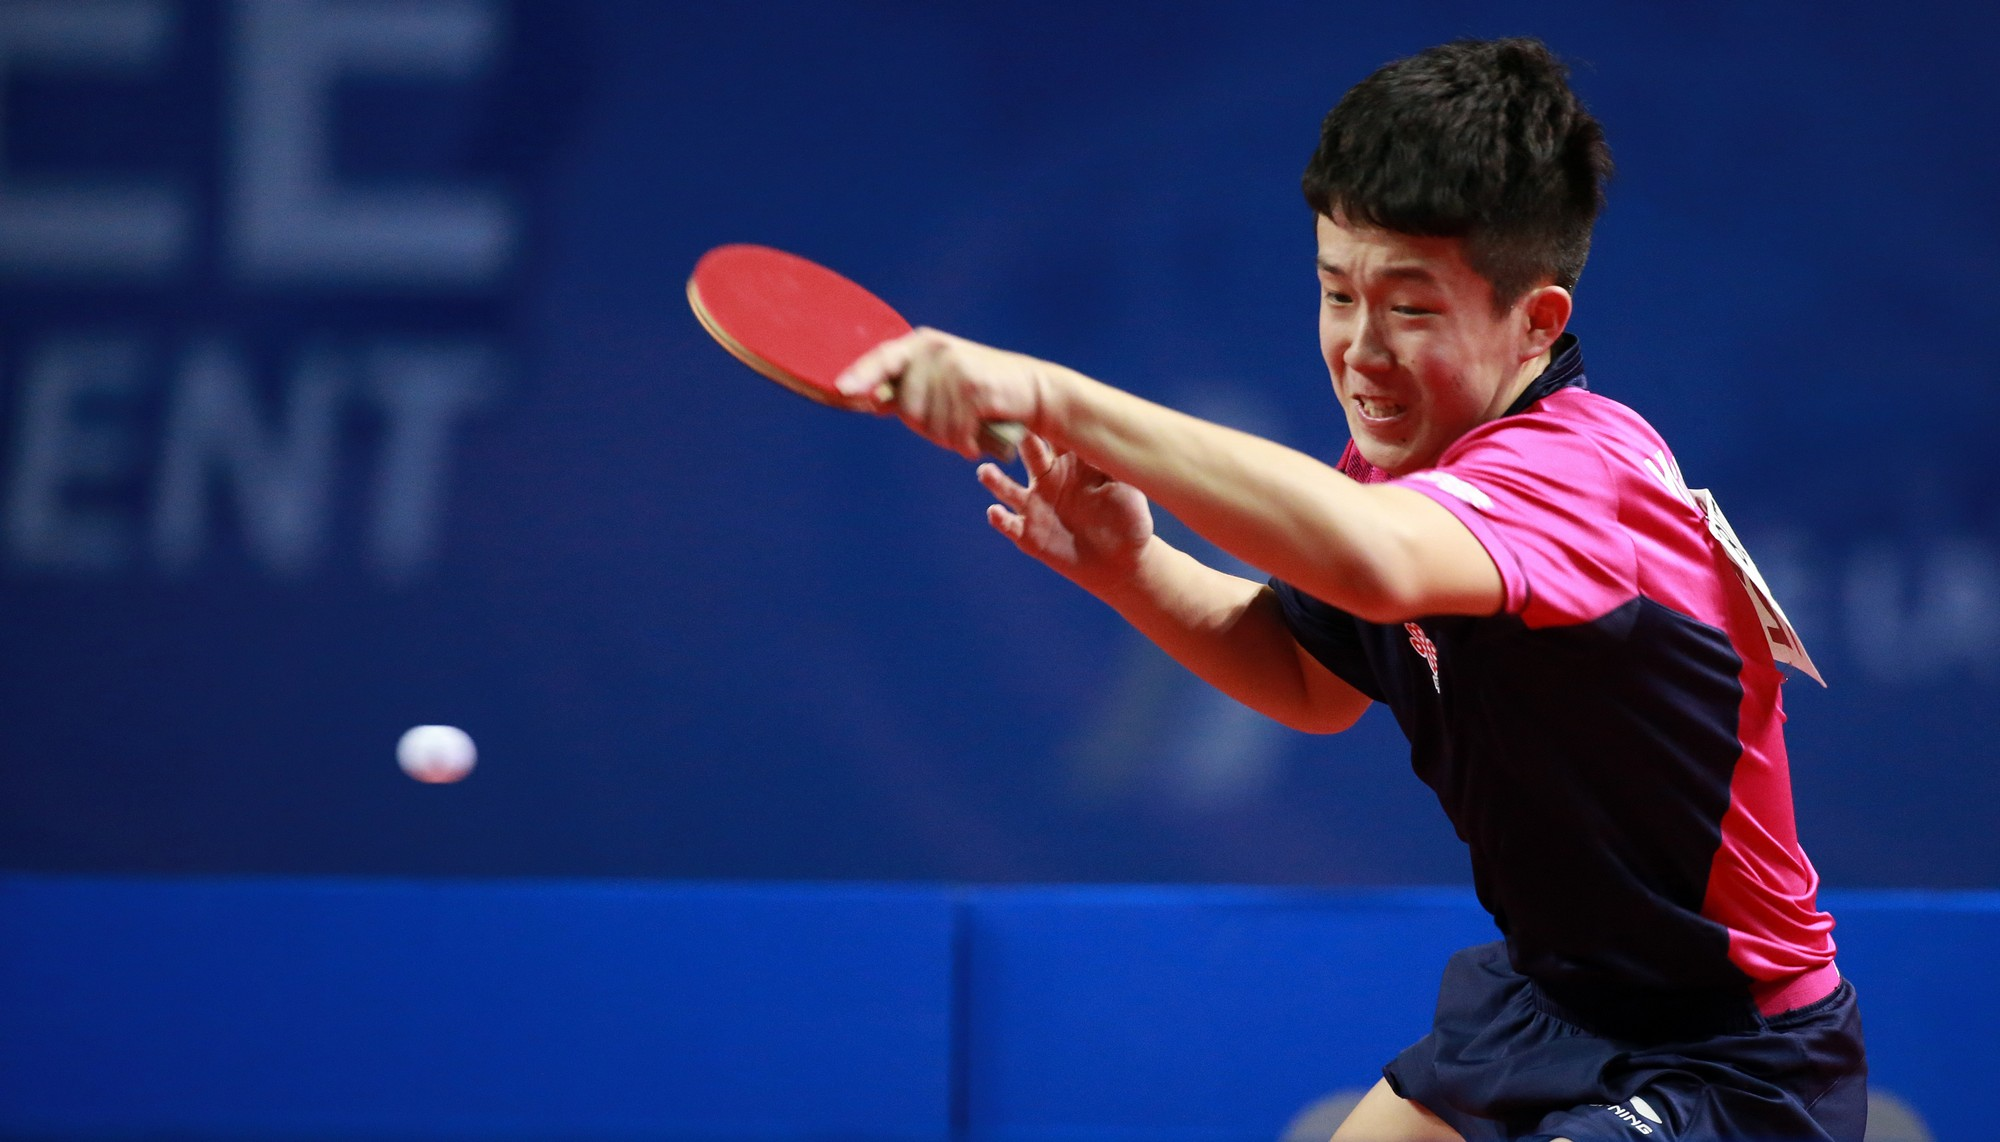 The talented WANG Chuqin